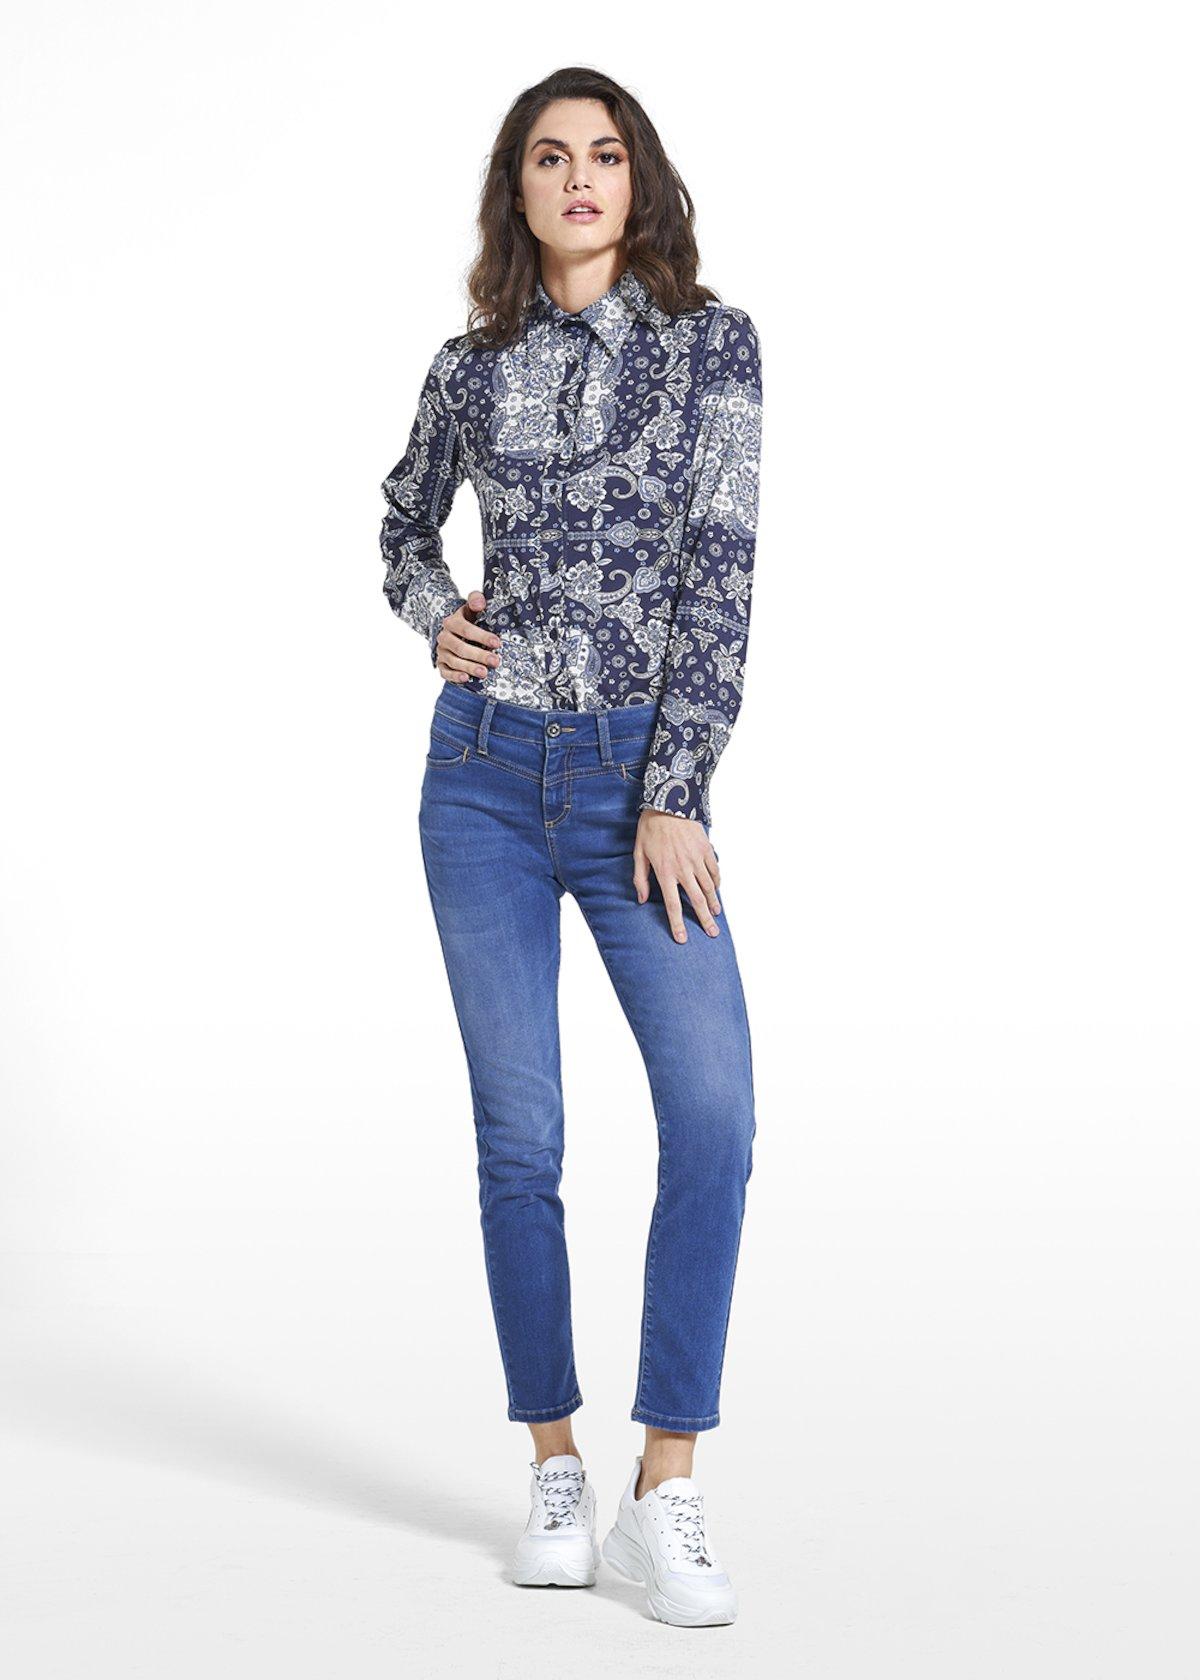 Blouse Carina in jersey patterned paisley bandana - Blue / White Fantasia - Woman - Category image